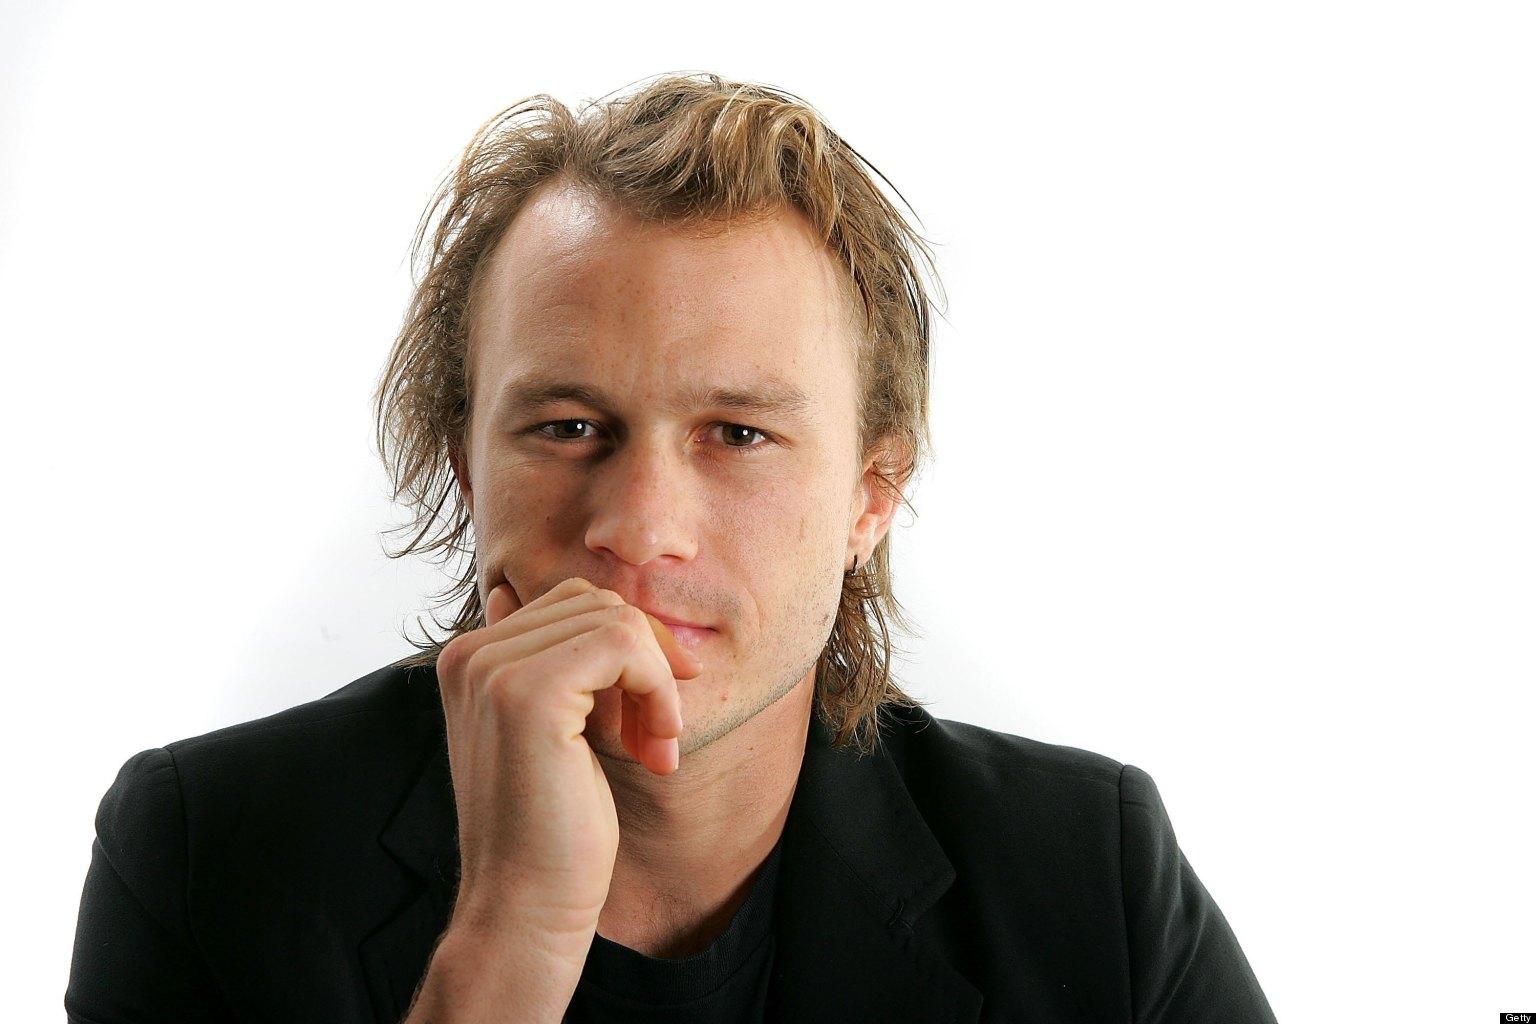 Heath Ledger HD wallpapers, Desktop wallpaper - most viewed